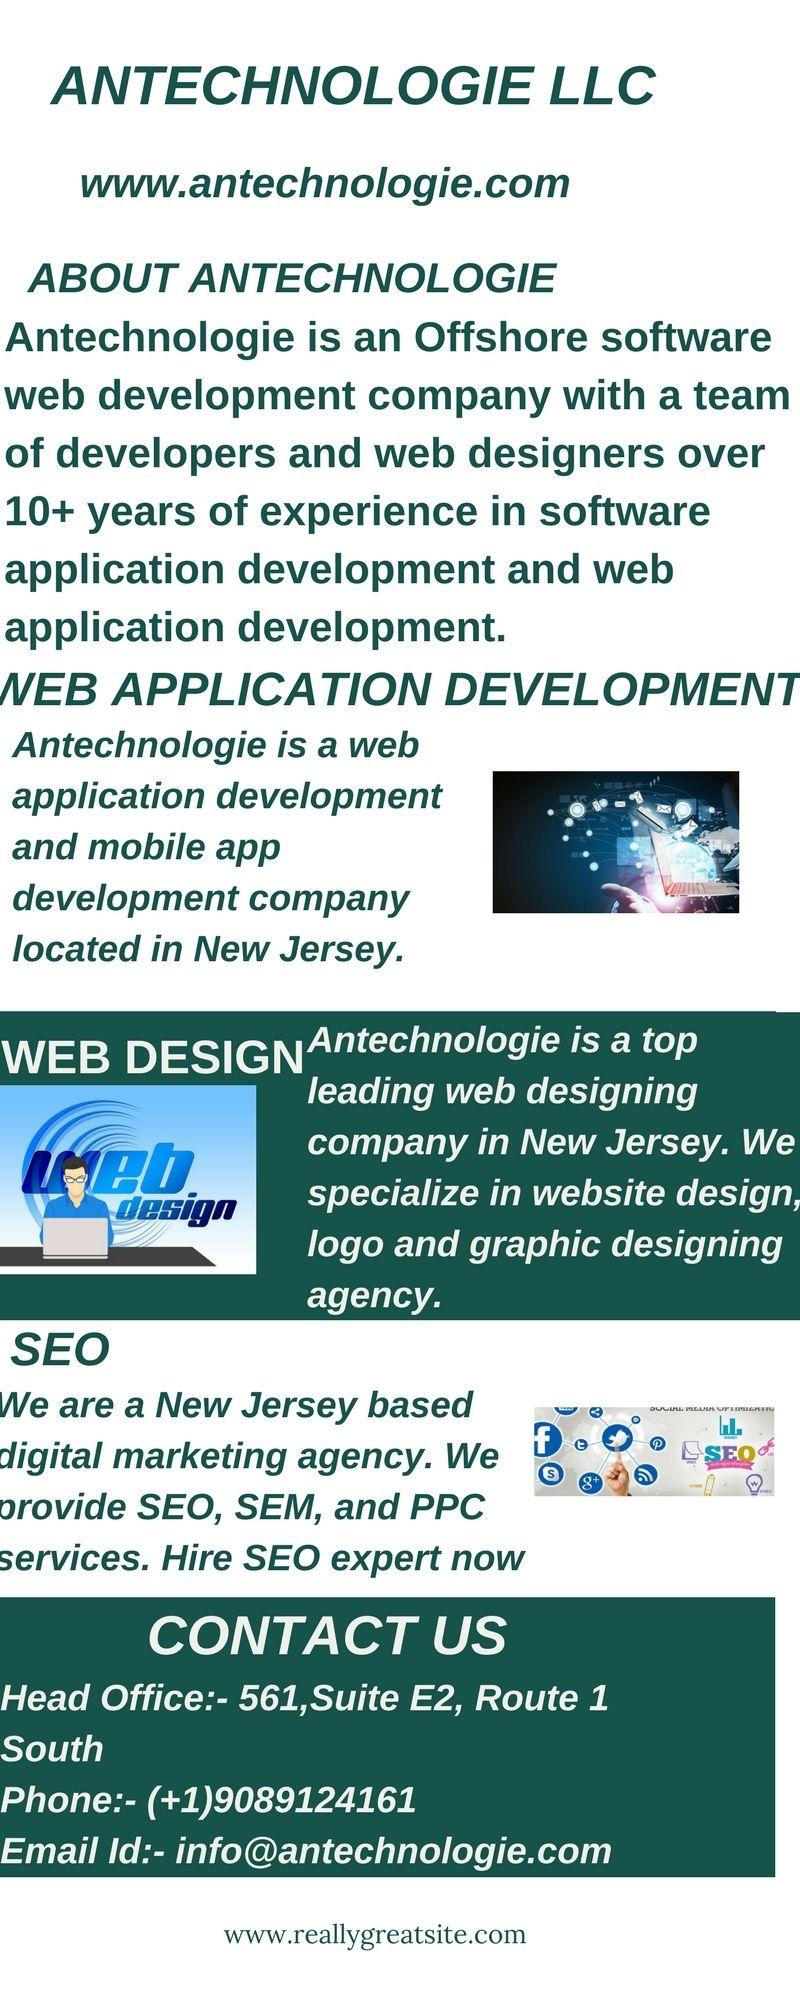 Antechnologie Web Design Company In Edison New Jersey A Web Design Com App Development Companies Web Application Development Mobile App Development Companies